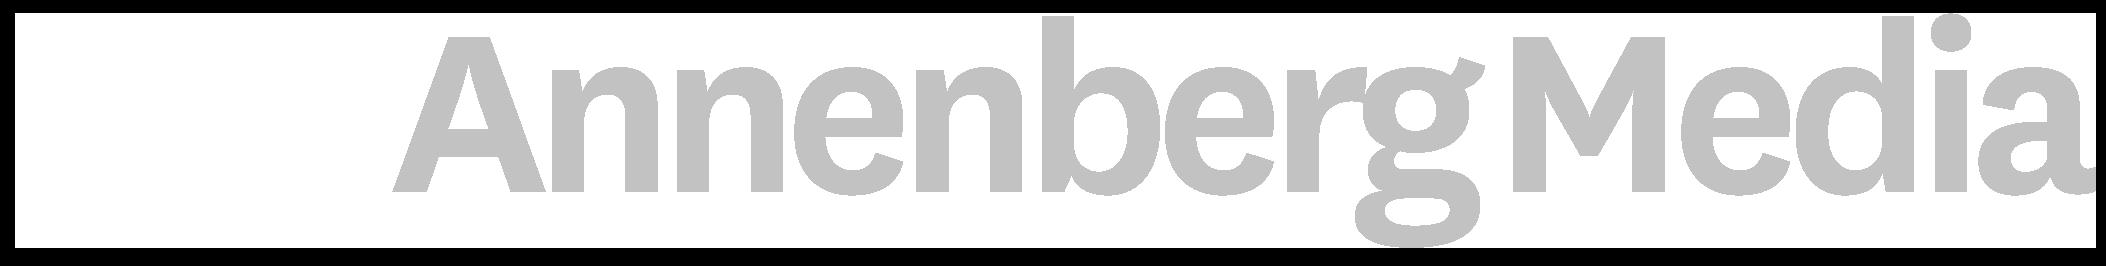 usc-am-logo_03.png